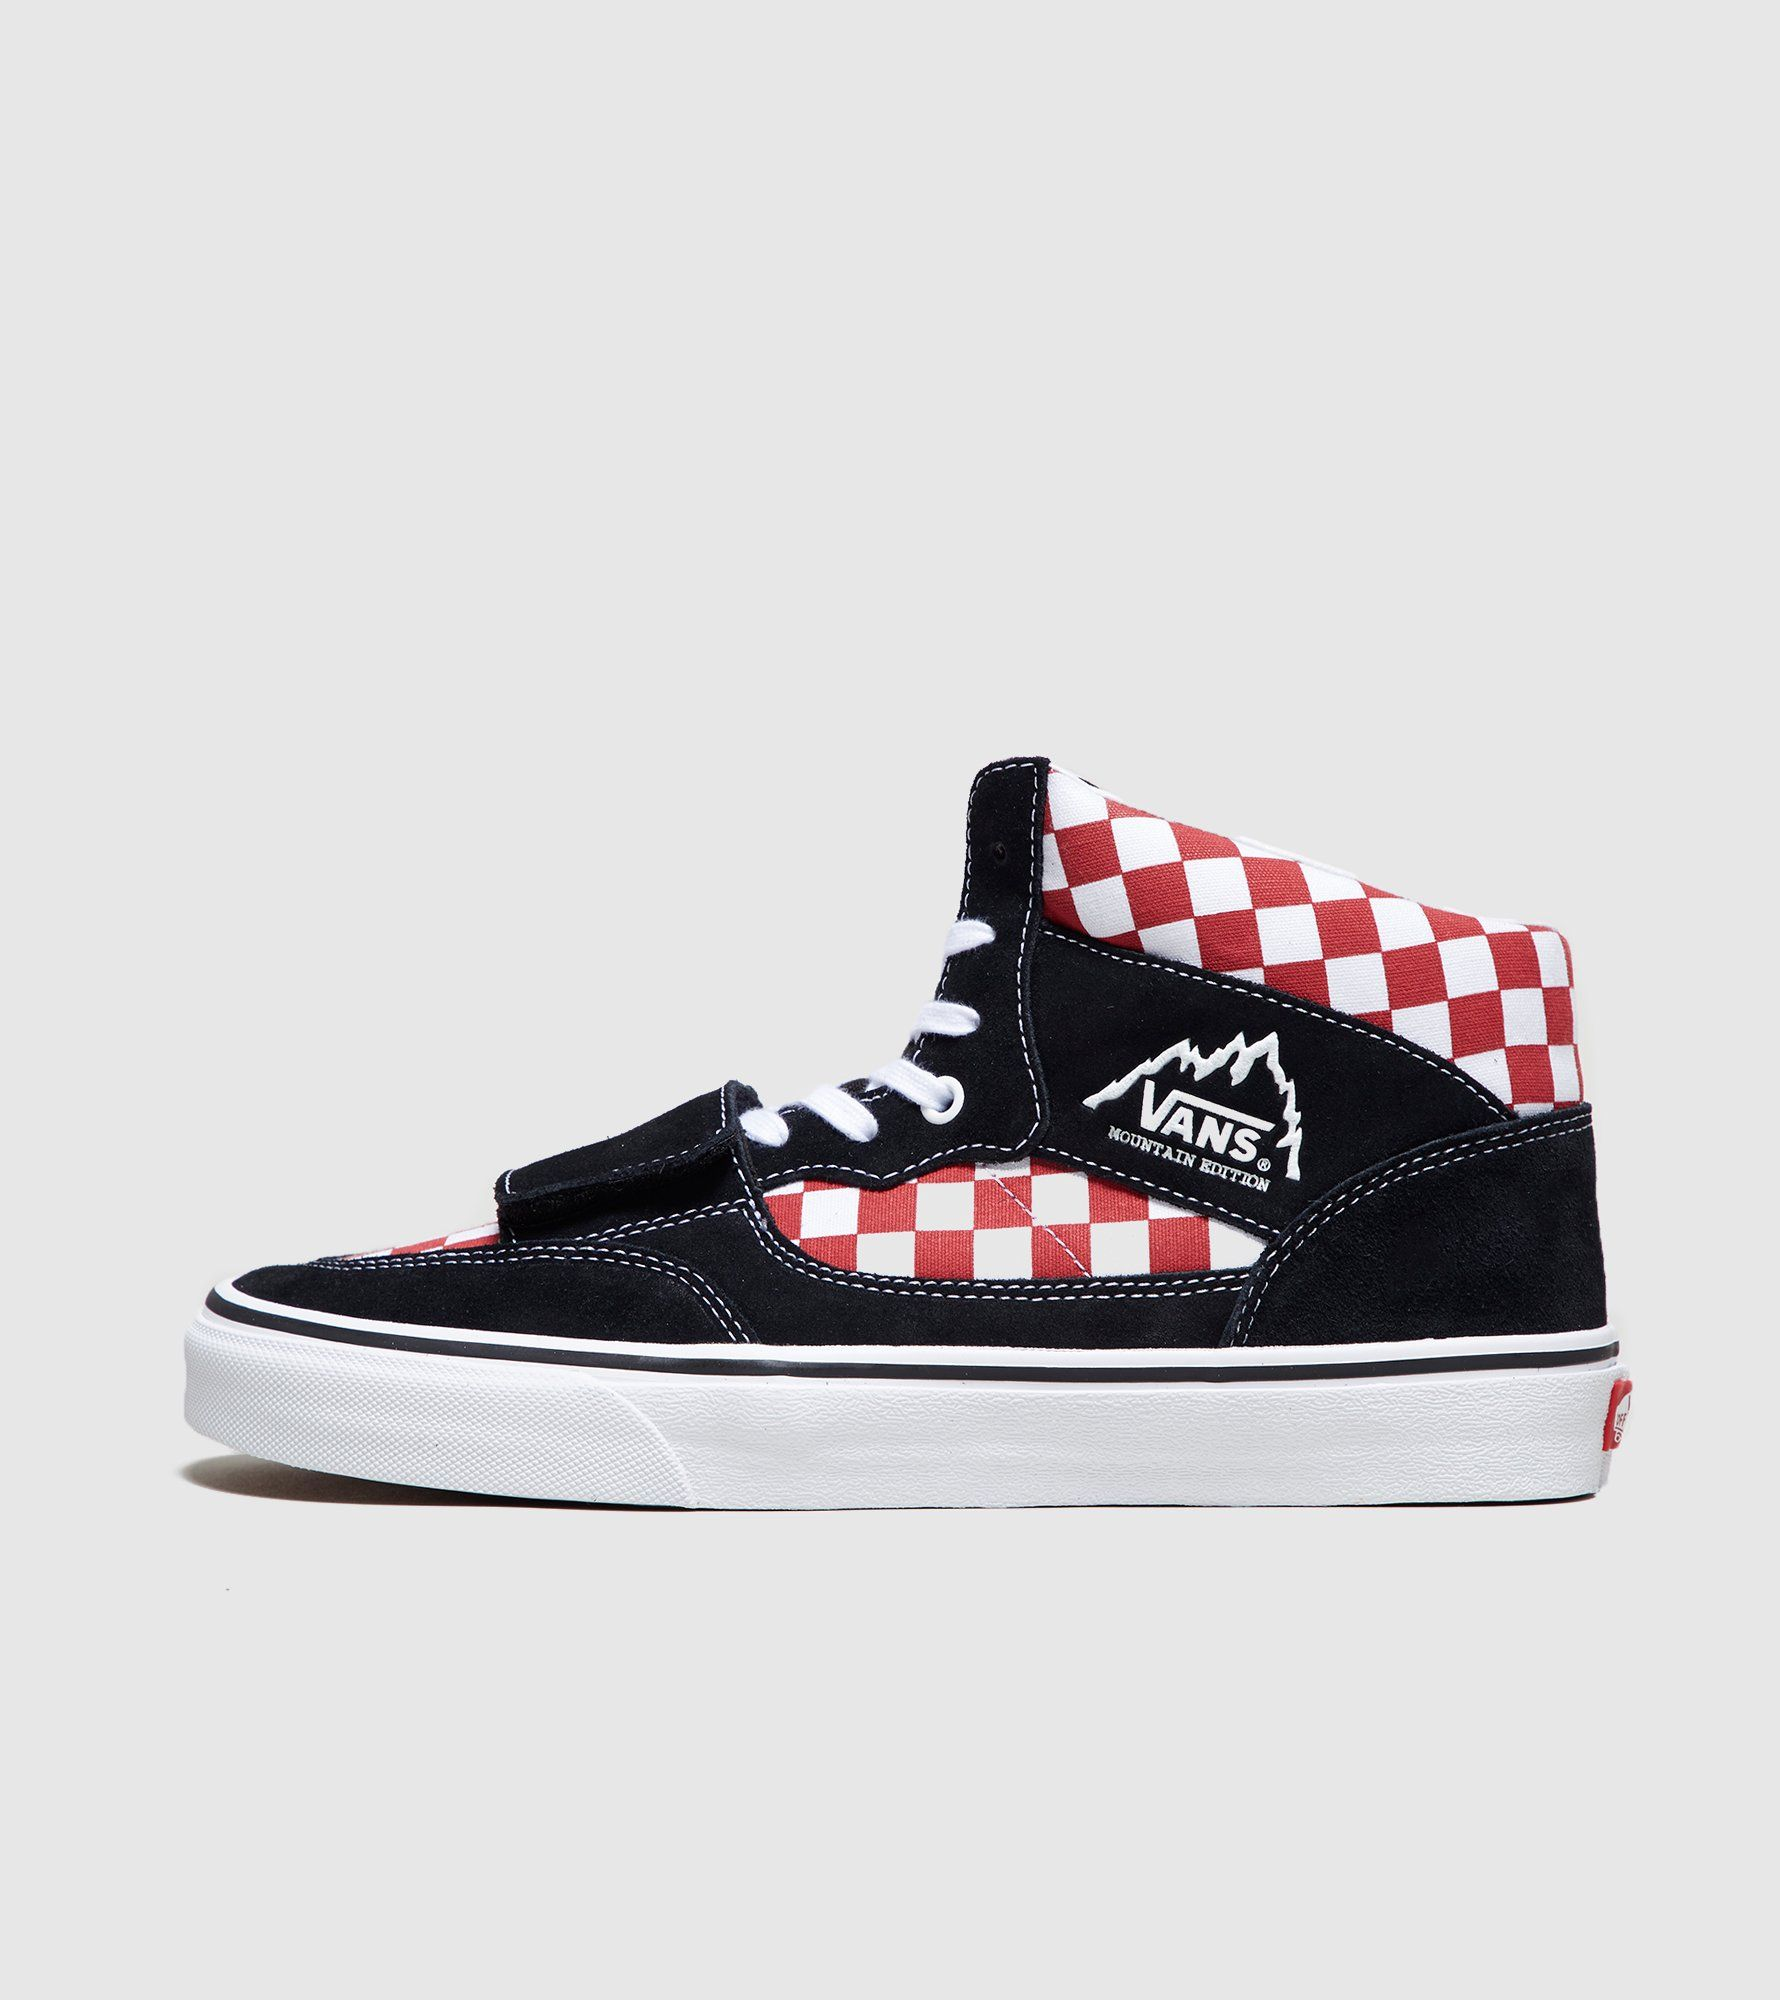 Vans Checkerboard Mountain Edition